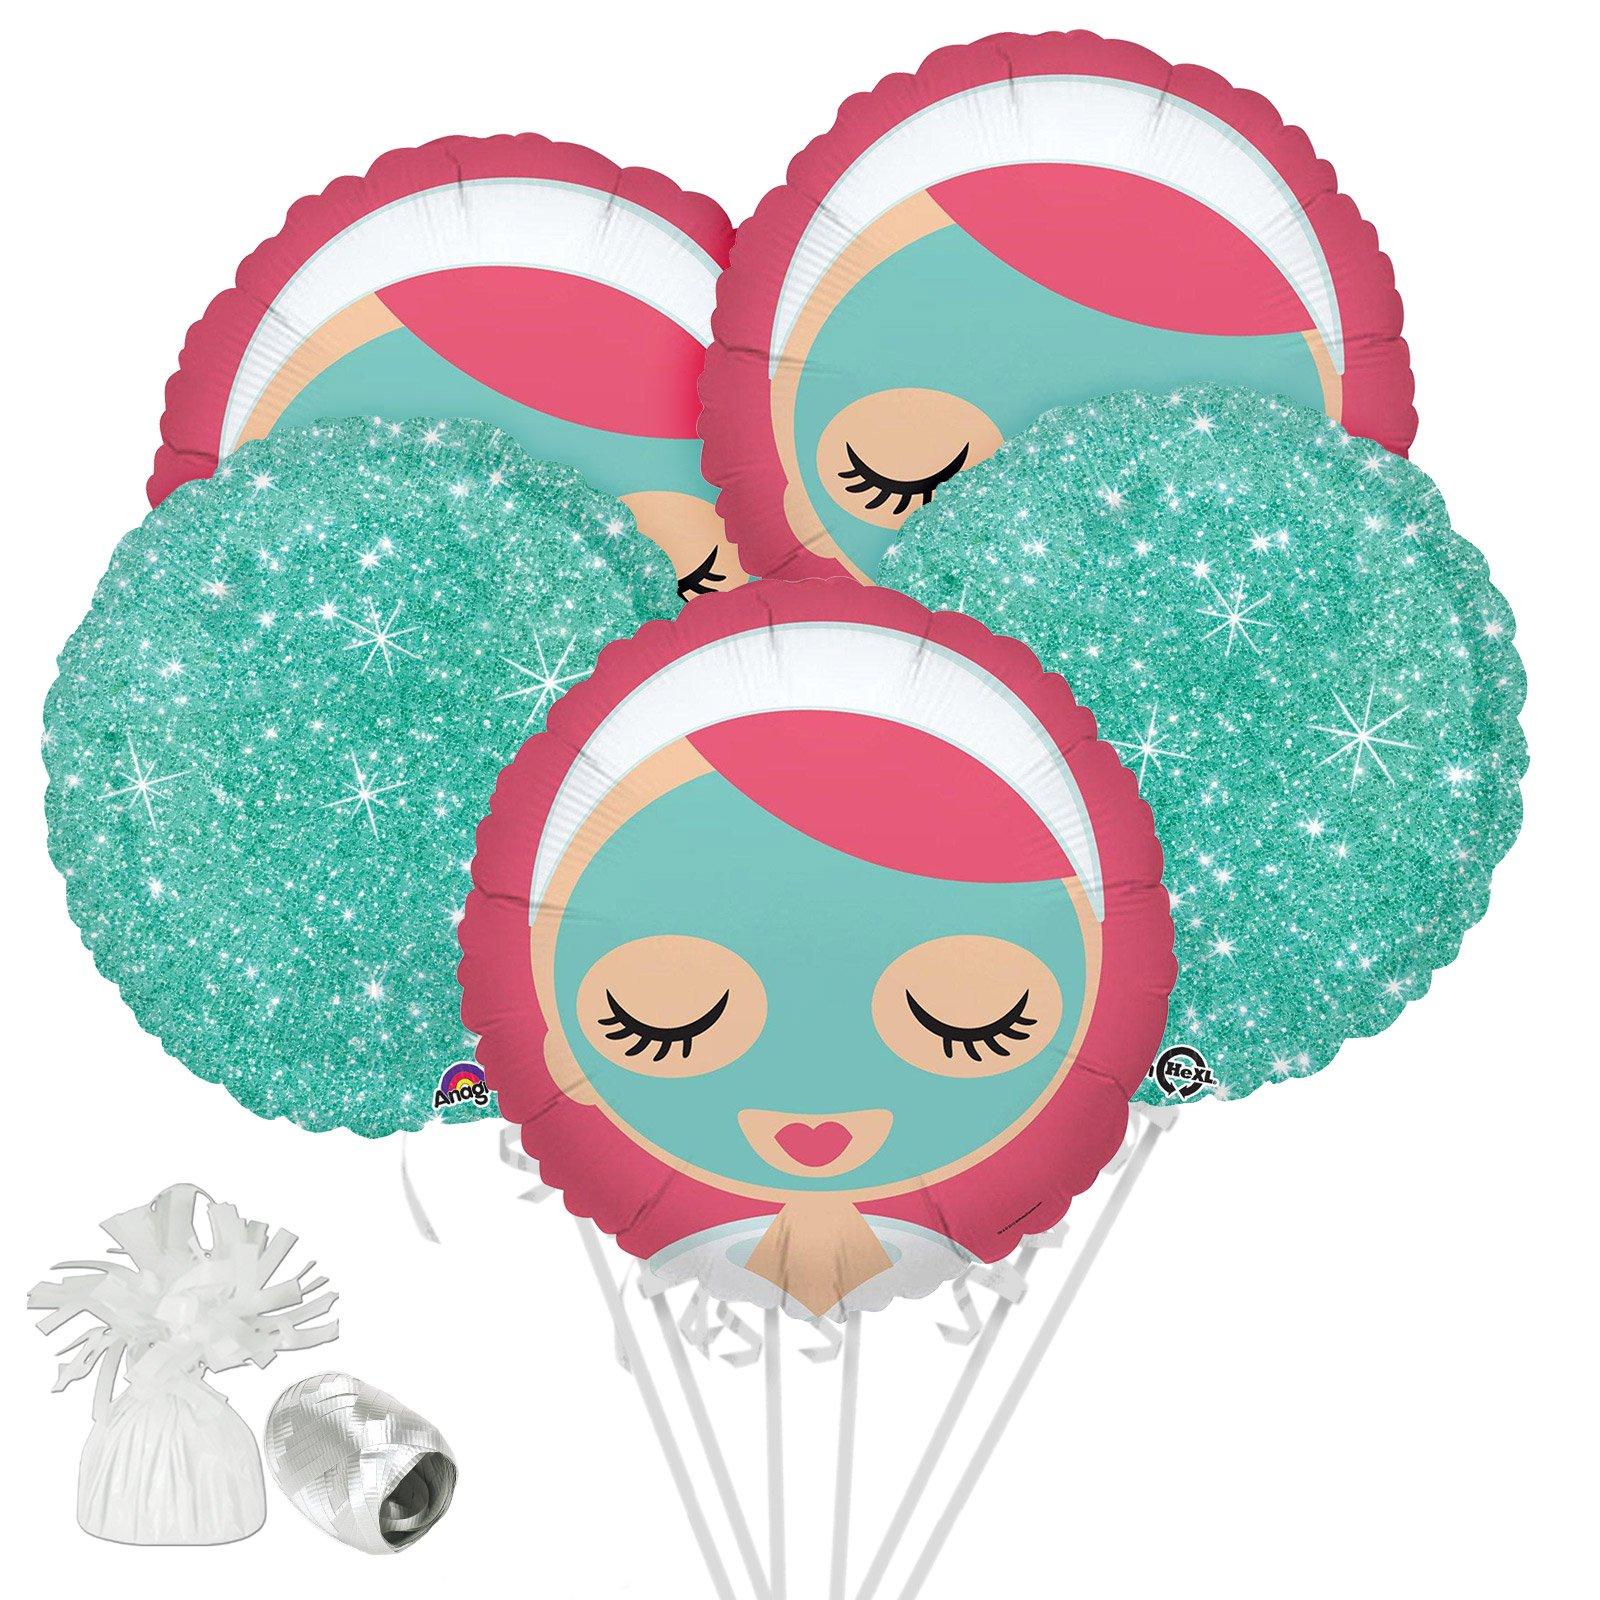 Costume SuperCenter Little Spa Balloon Bouquet Kit